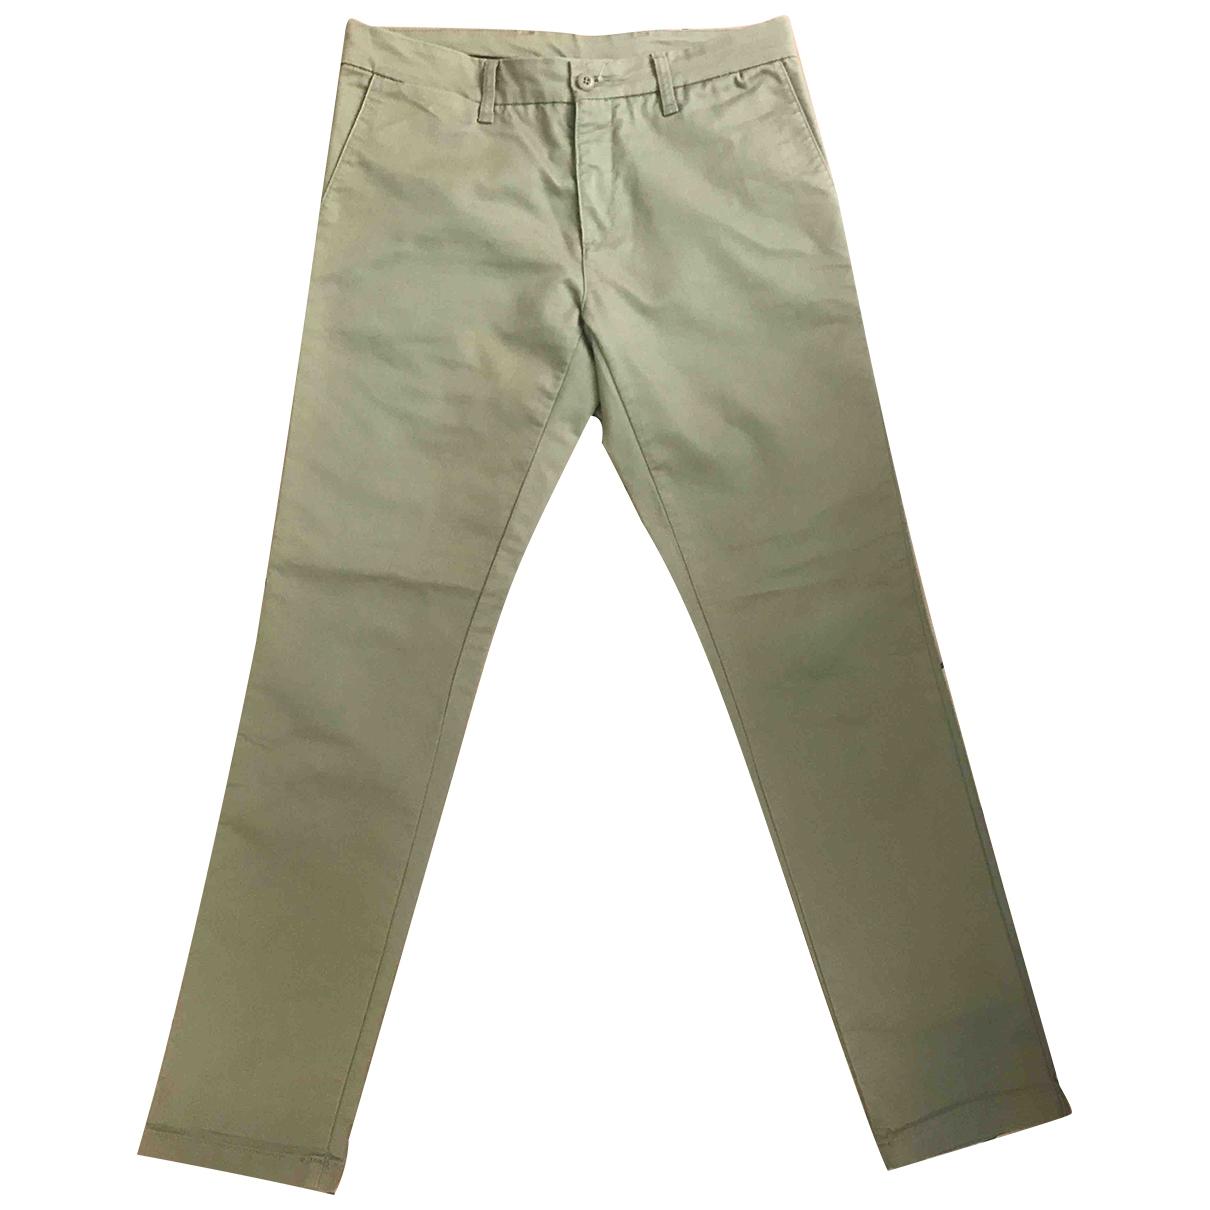 Pantalones en Algodon Beige Carhartt